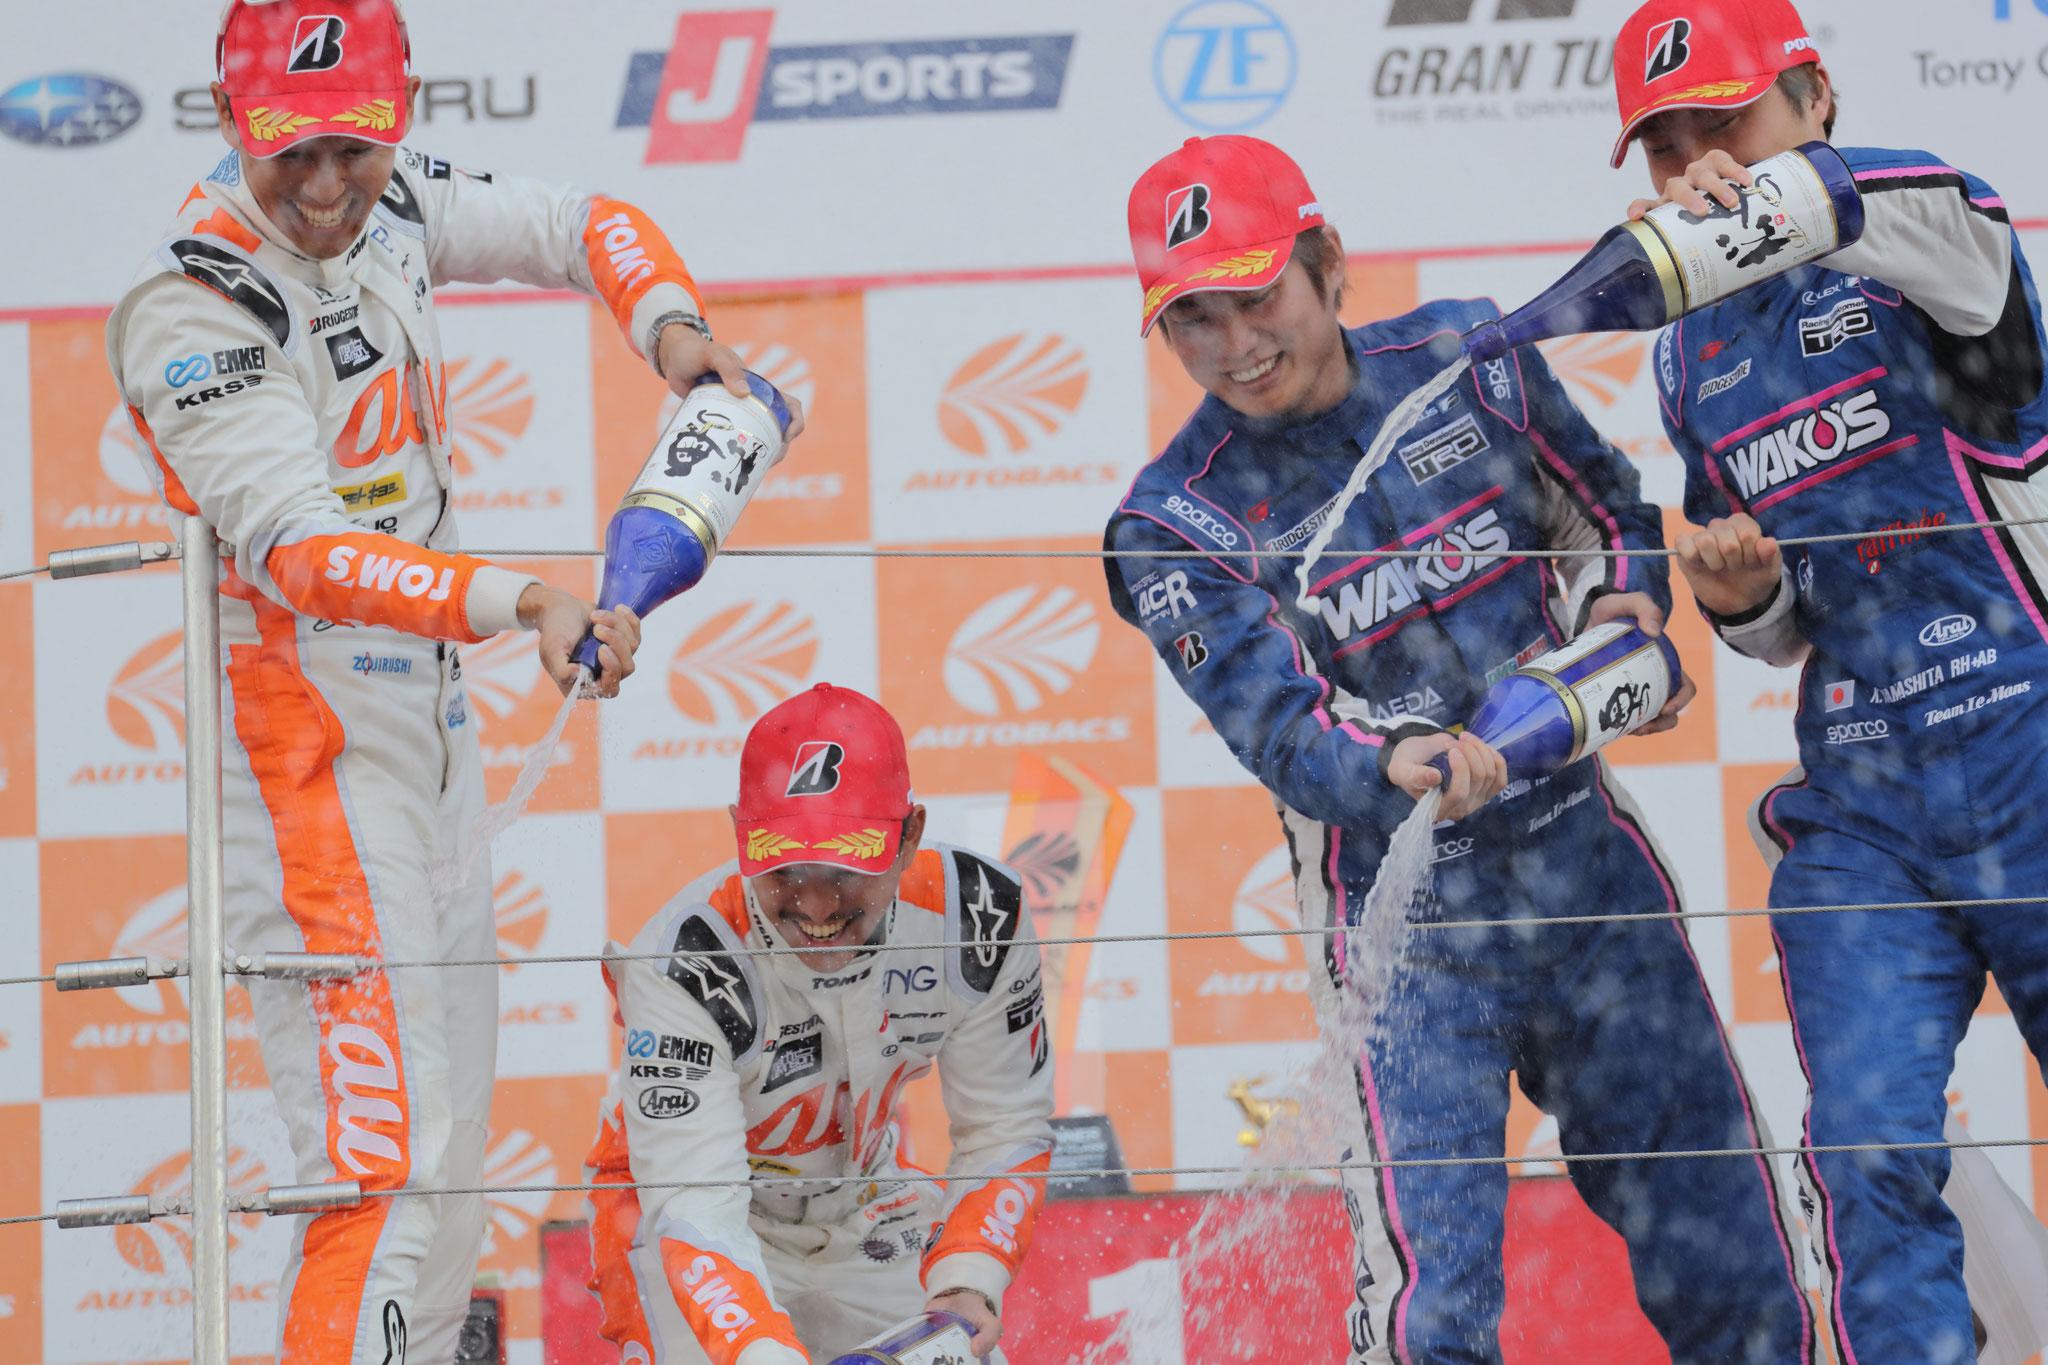 大嶋和也 2019 SUPER GT 第3戦 鈴鹿 3位 Finish